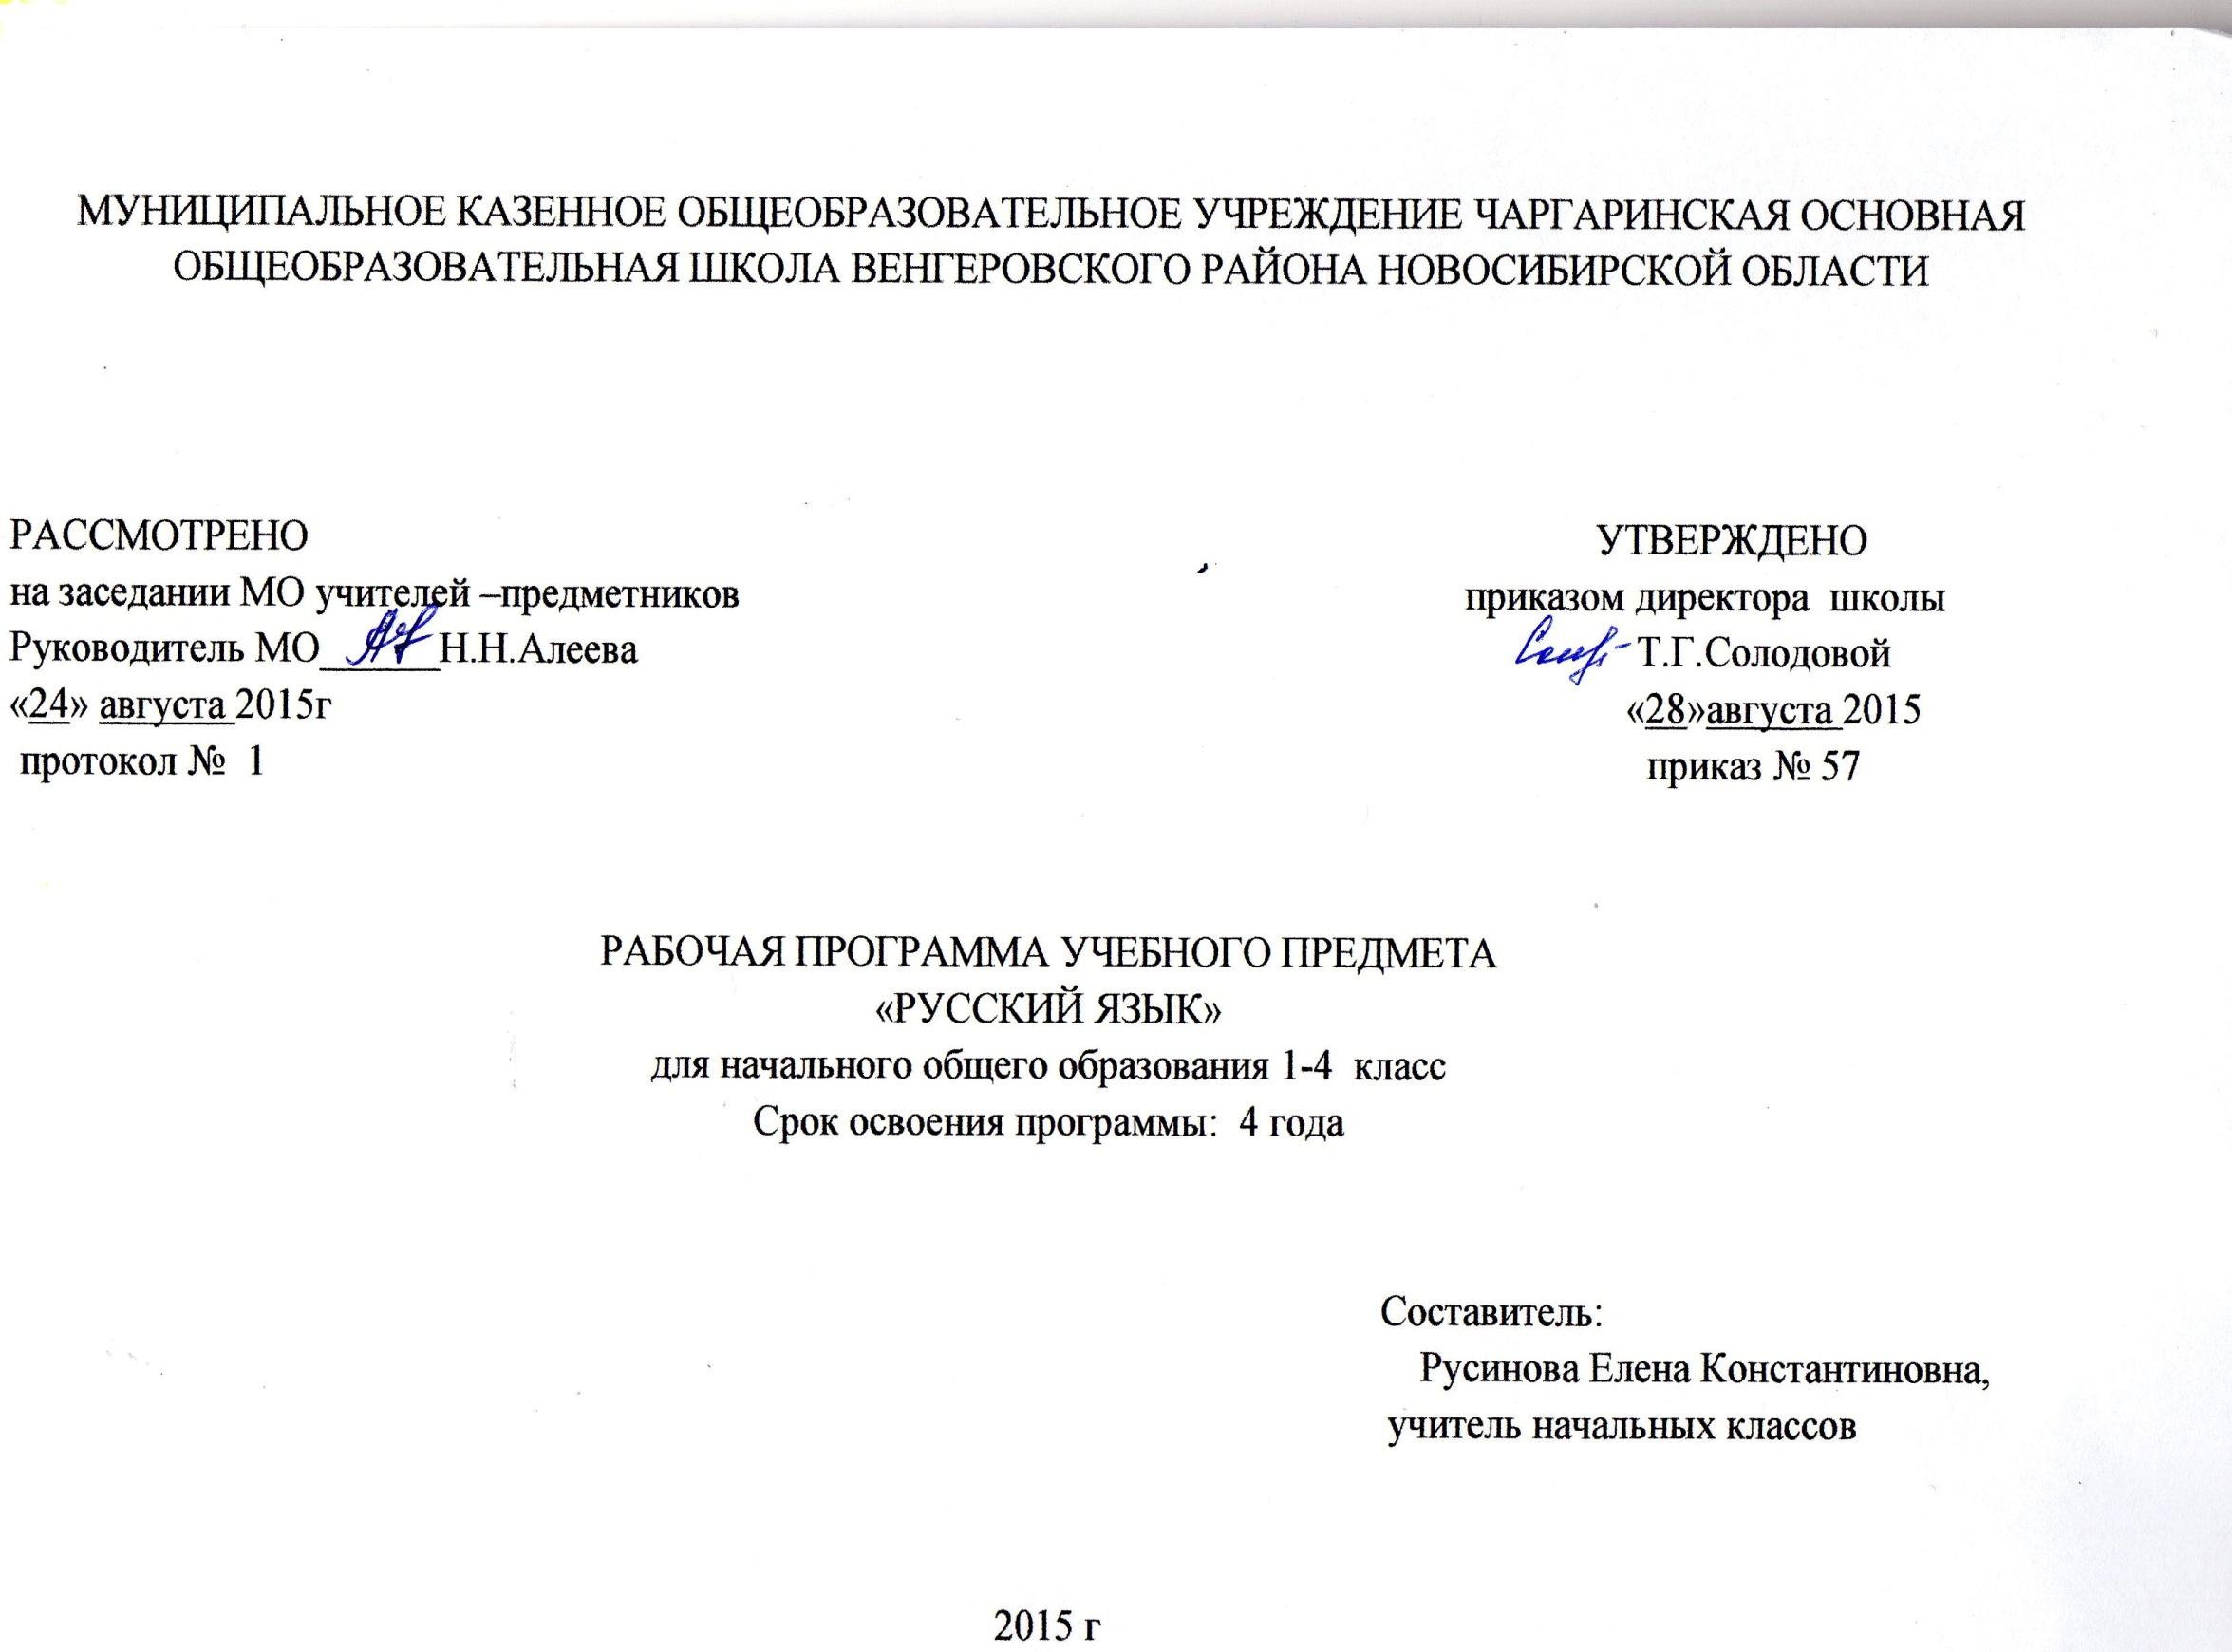 C:\Documents and Settings\Admin\Рабочий стол\img187.jpg